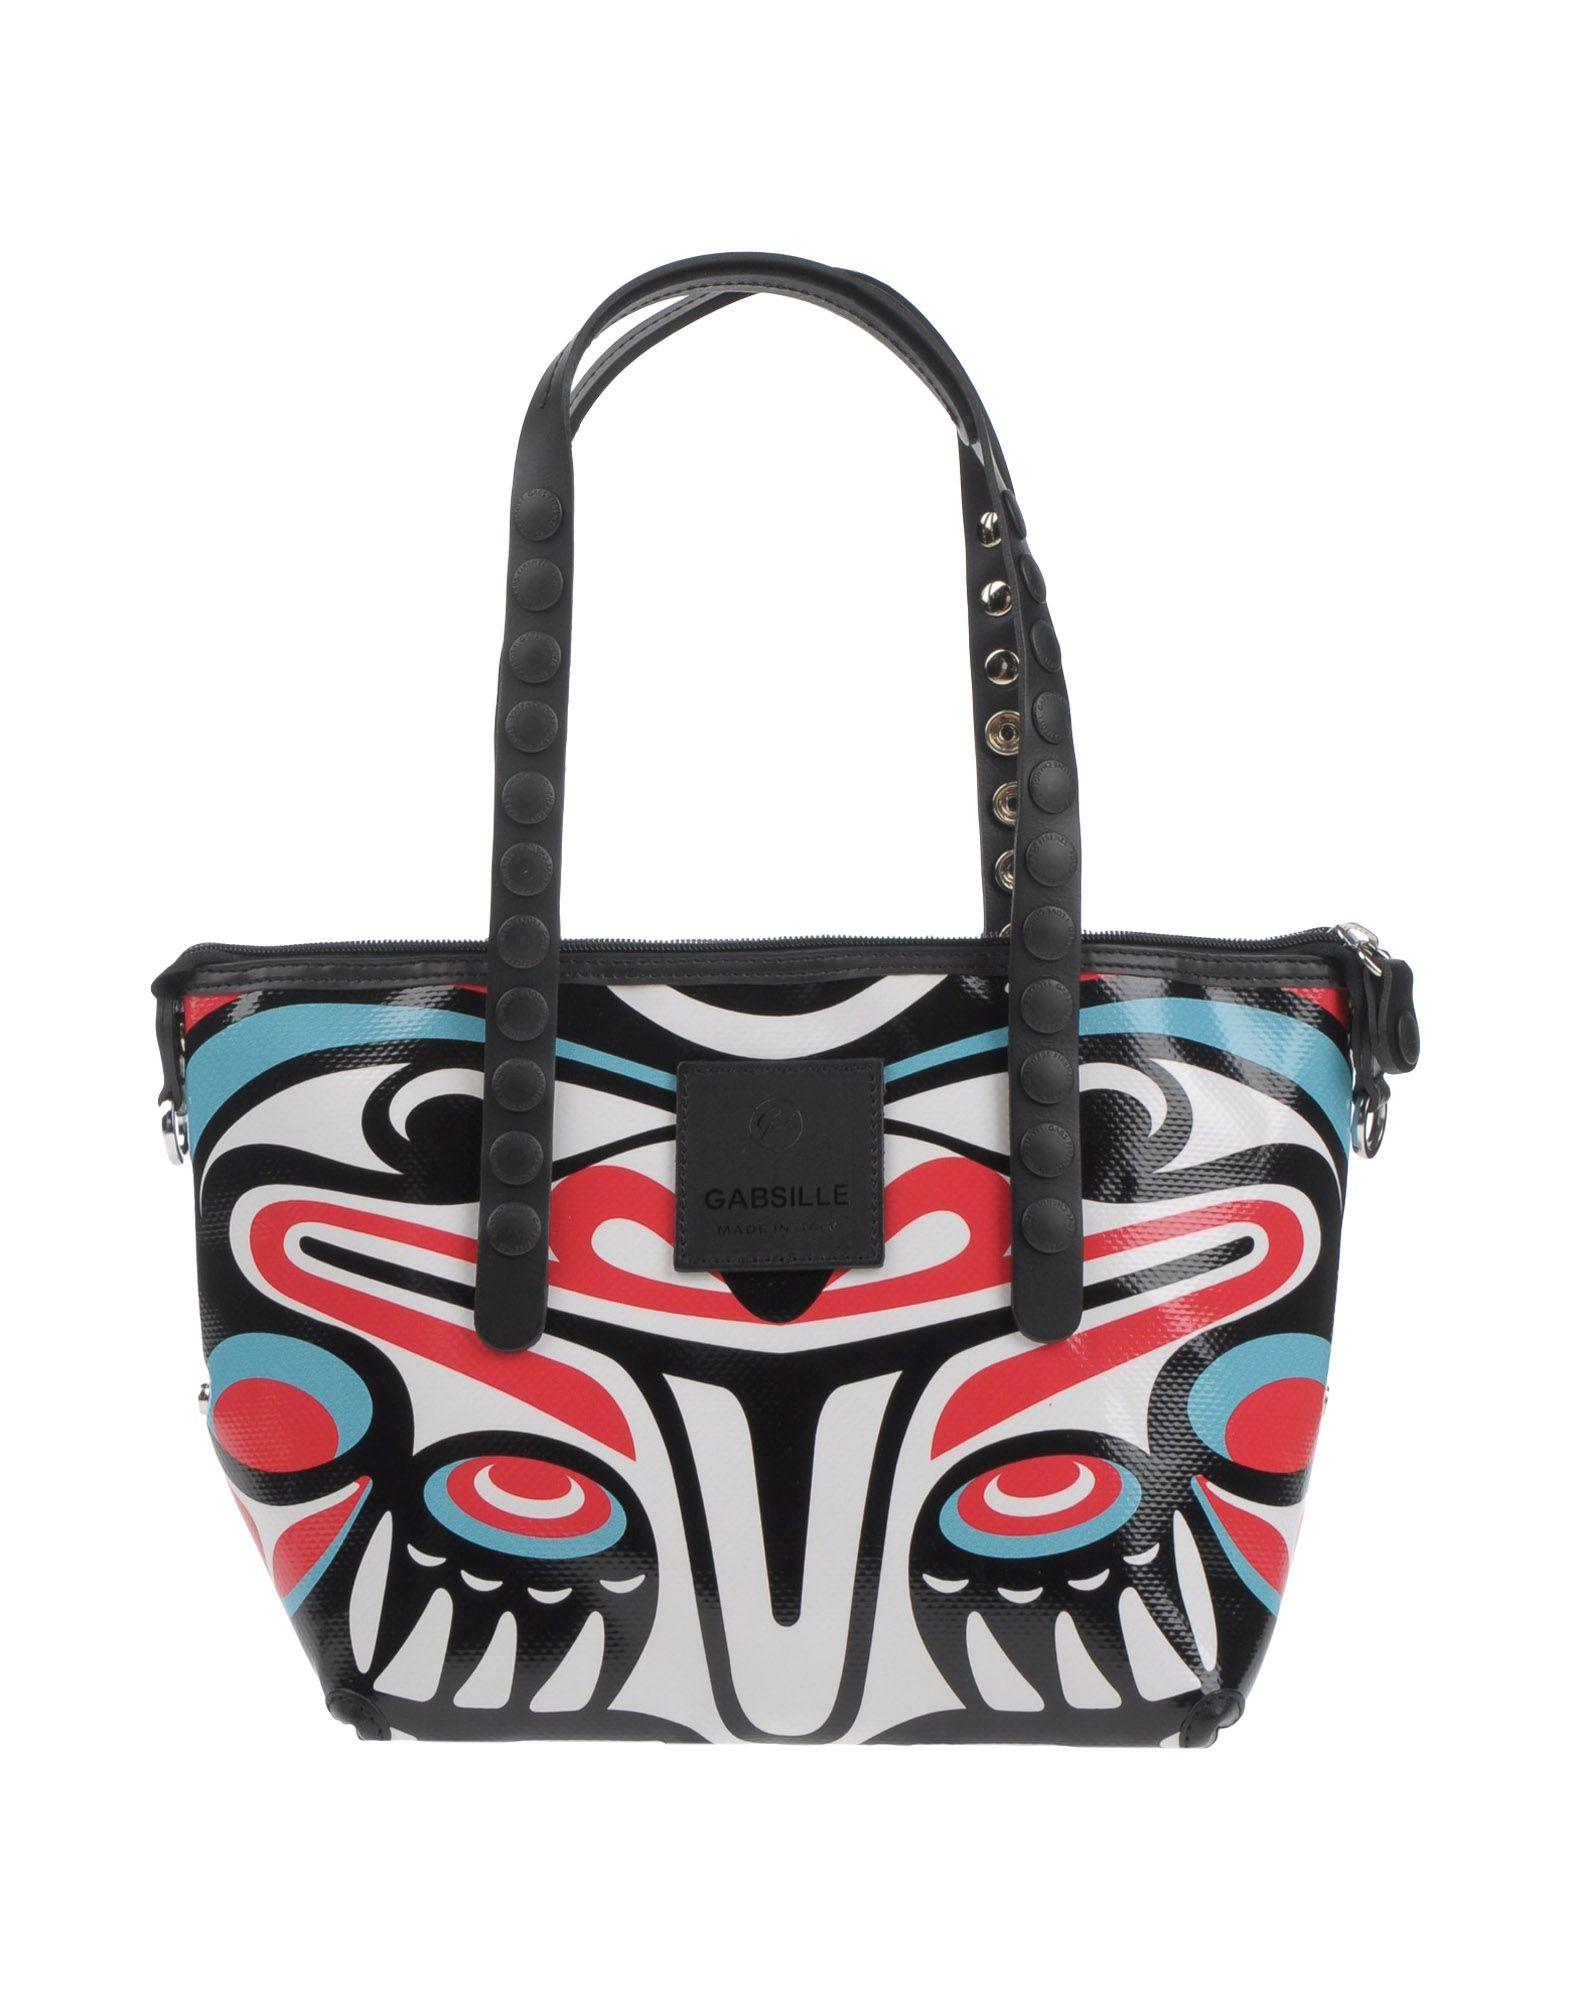 76ffc3ba44c5 Gabs Women - Bags - Shop Online at YOOX